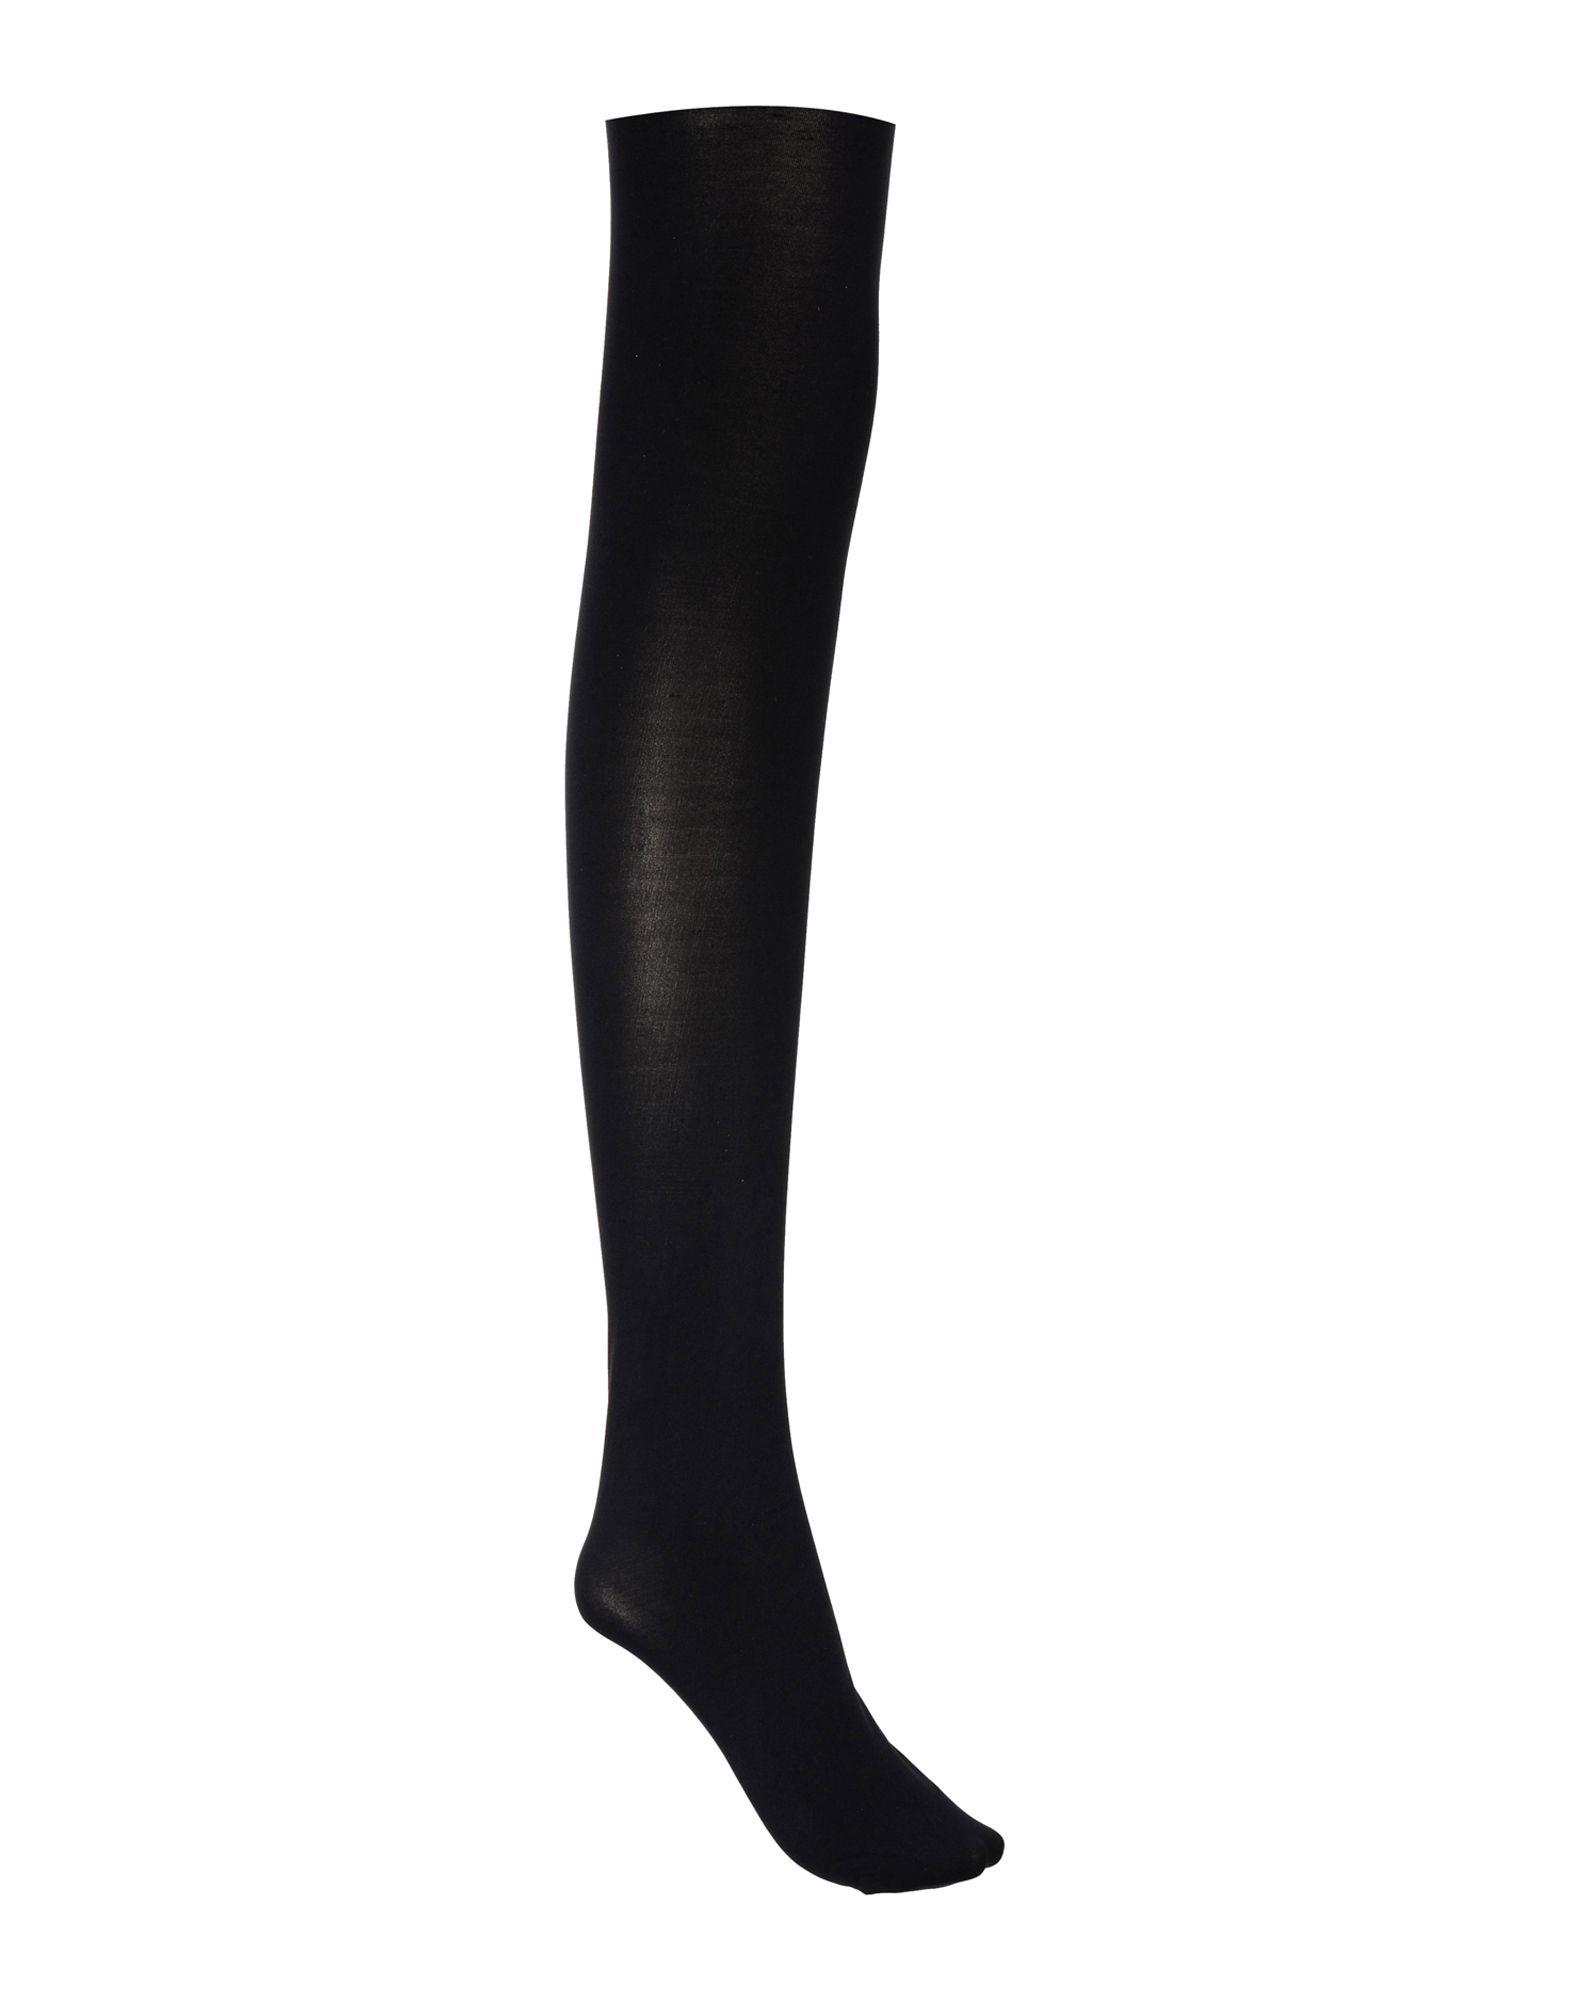 EMILIO CAVALLINI Socks & Tights in Black